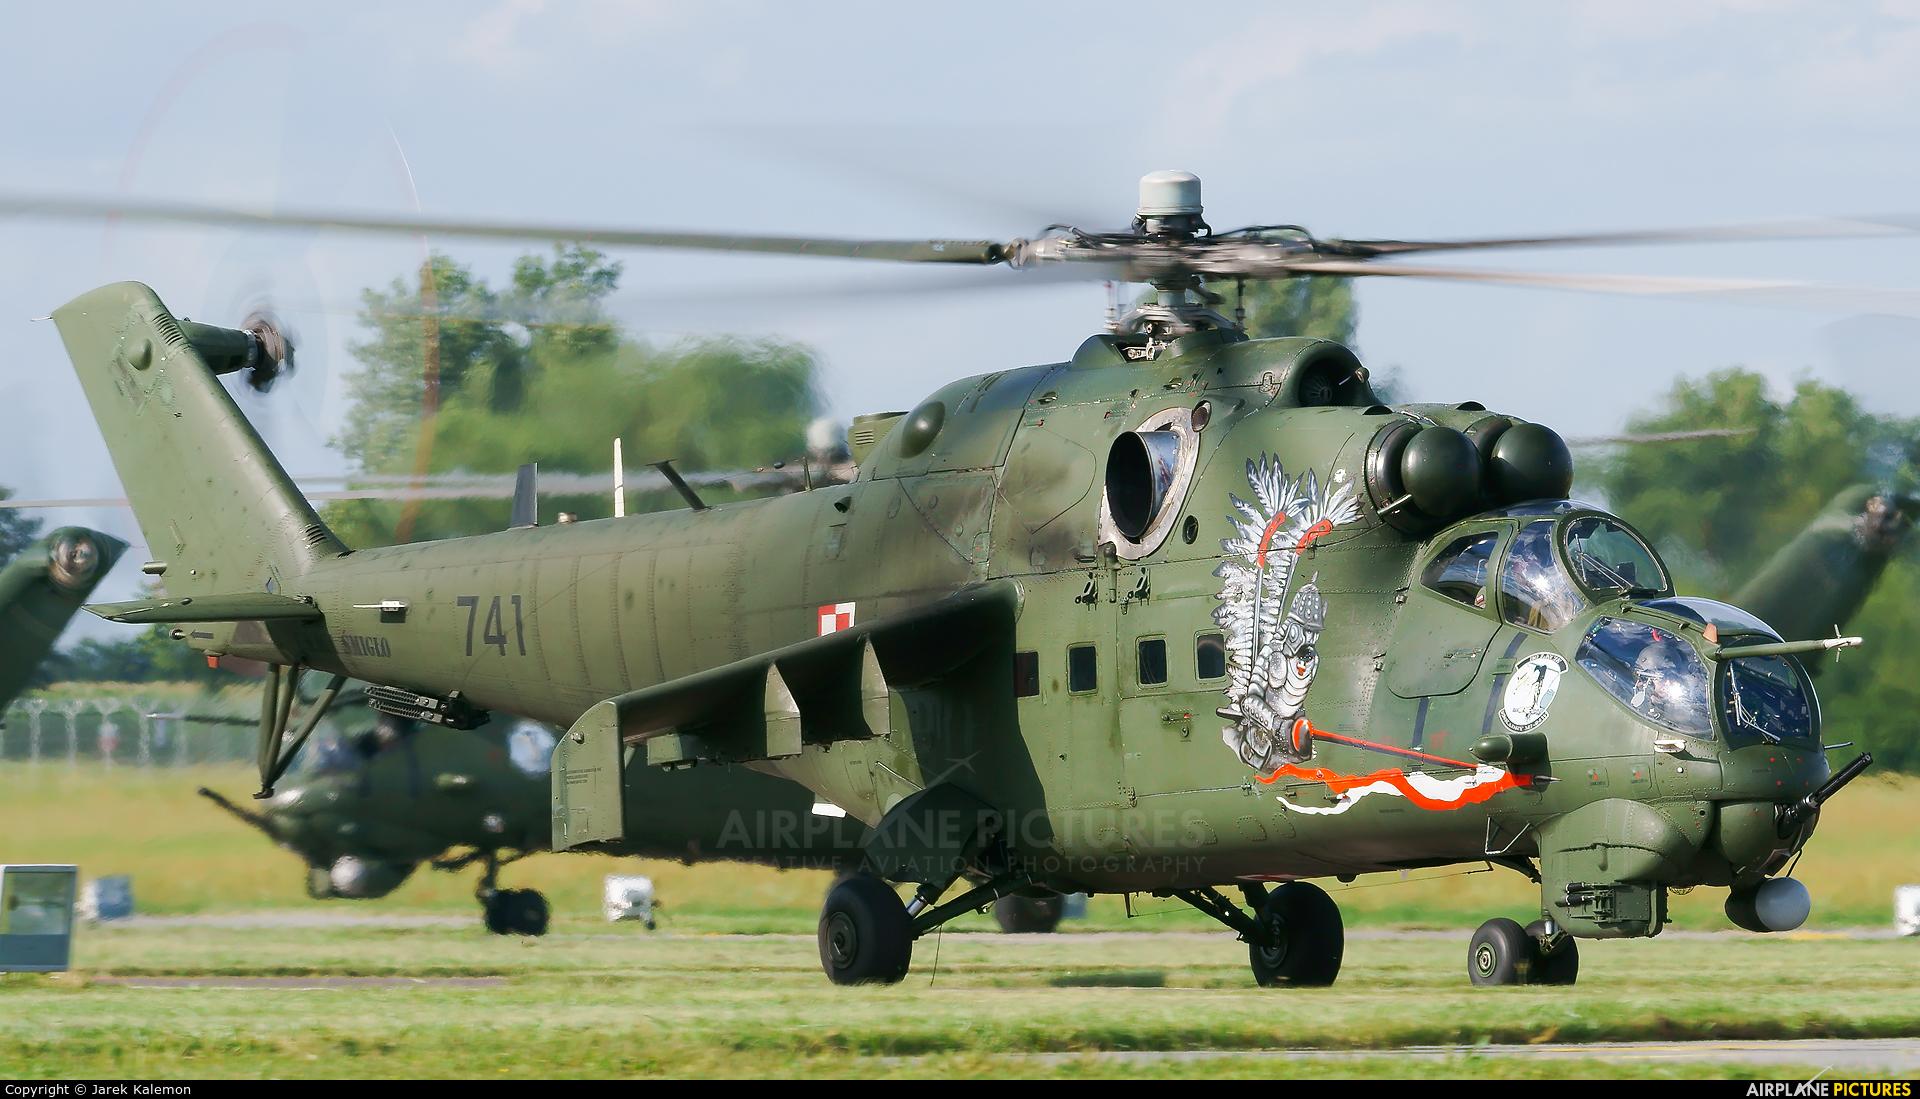 Poland - Army 741 aircraft at Inowrocław - Latkowo